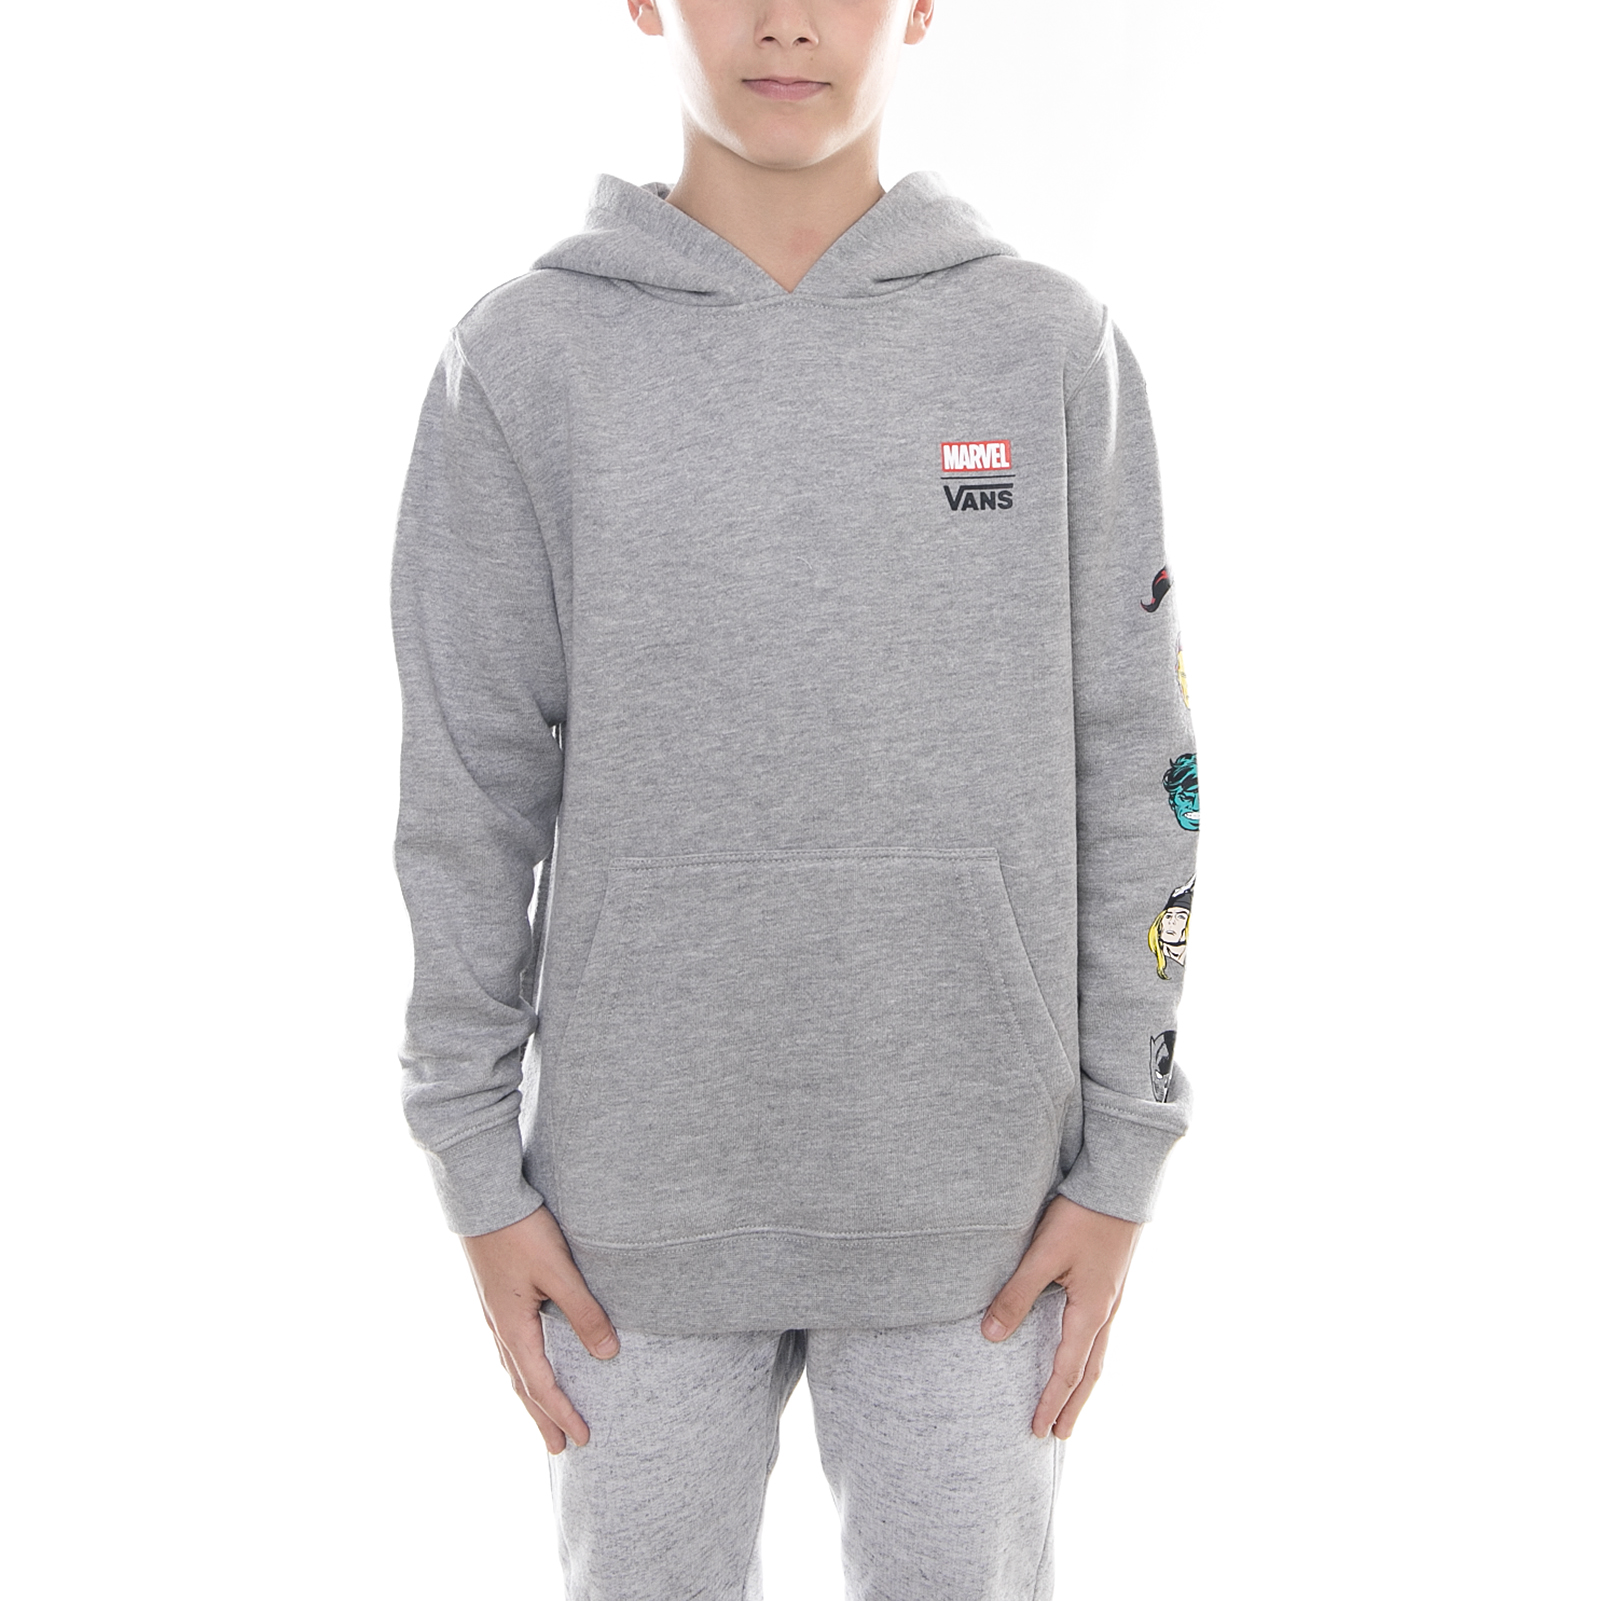 Details about Vans Sweatshirts by Vans x Marvel Cha Cement Heath Grey